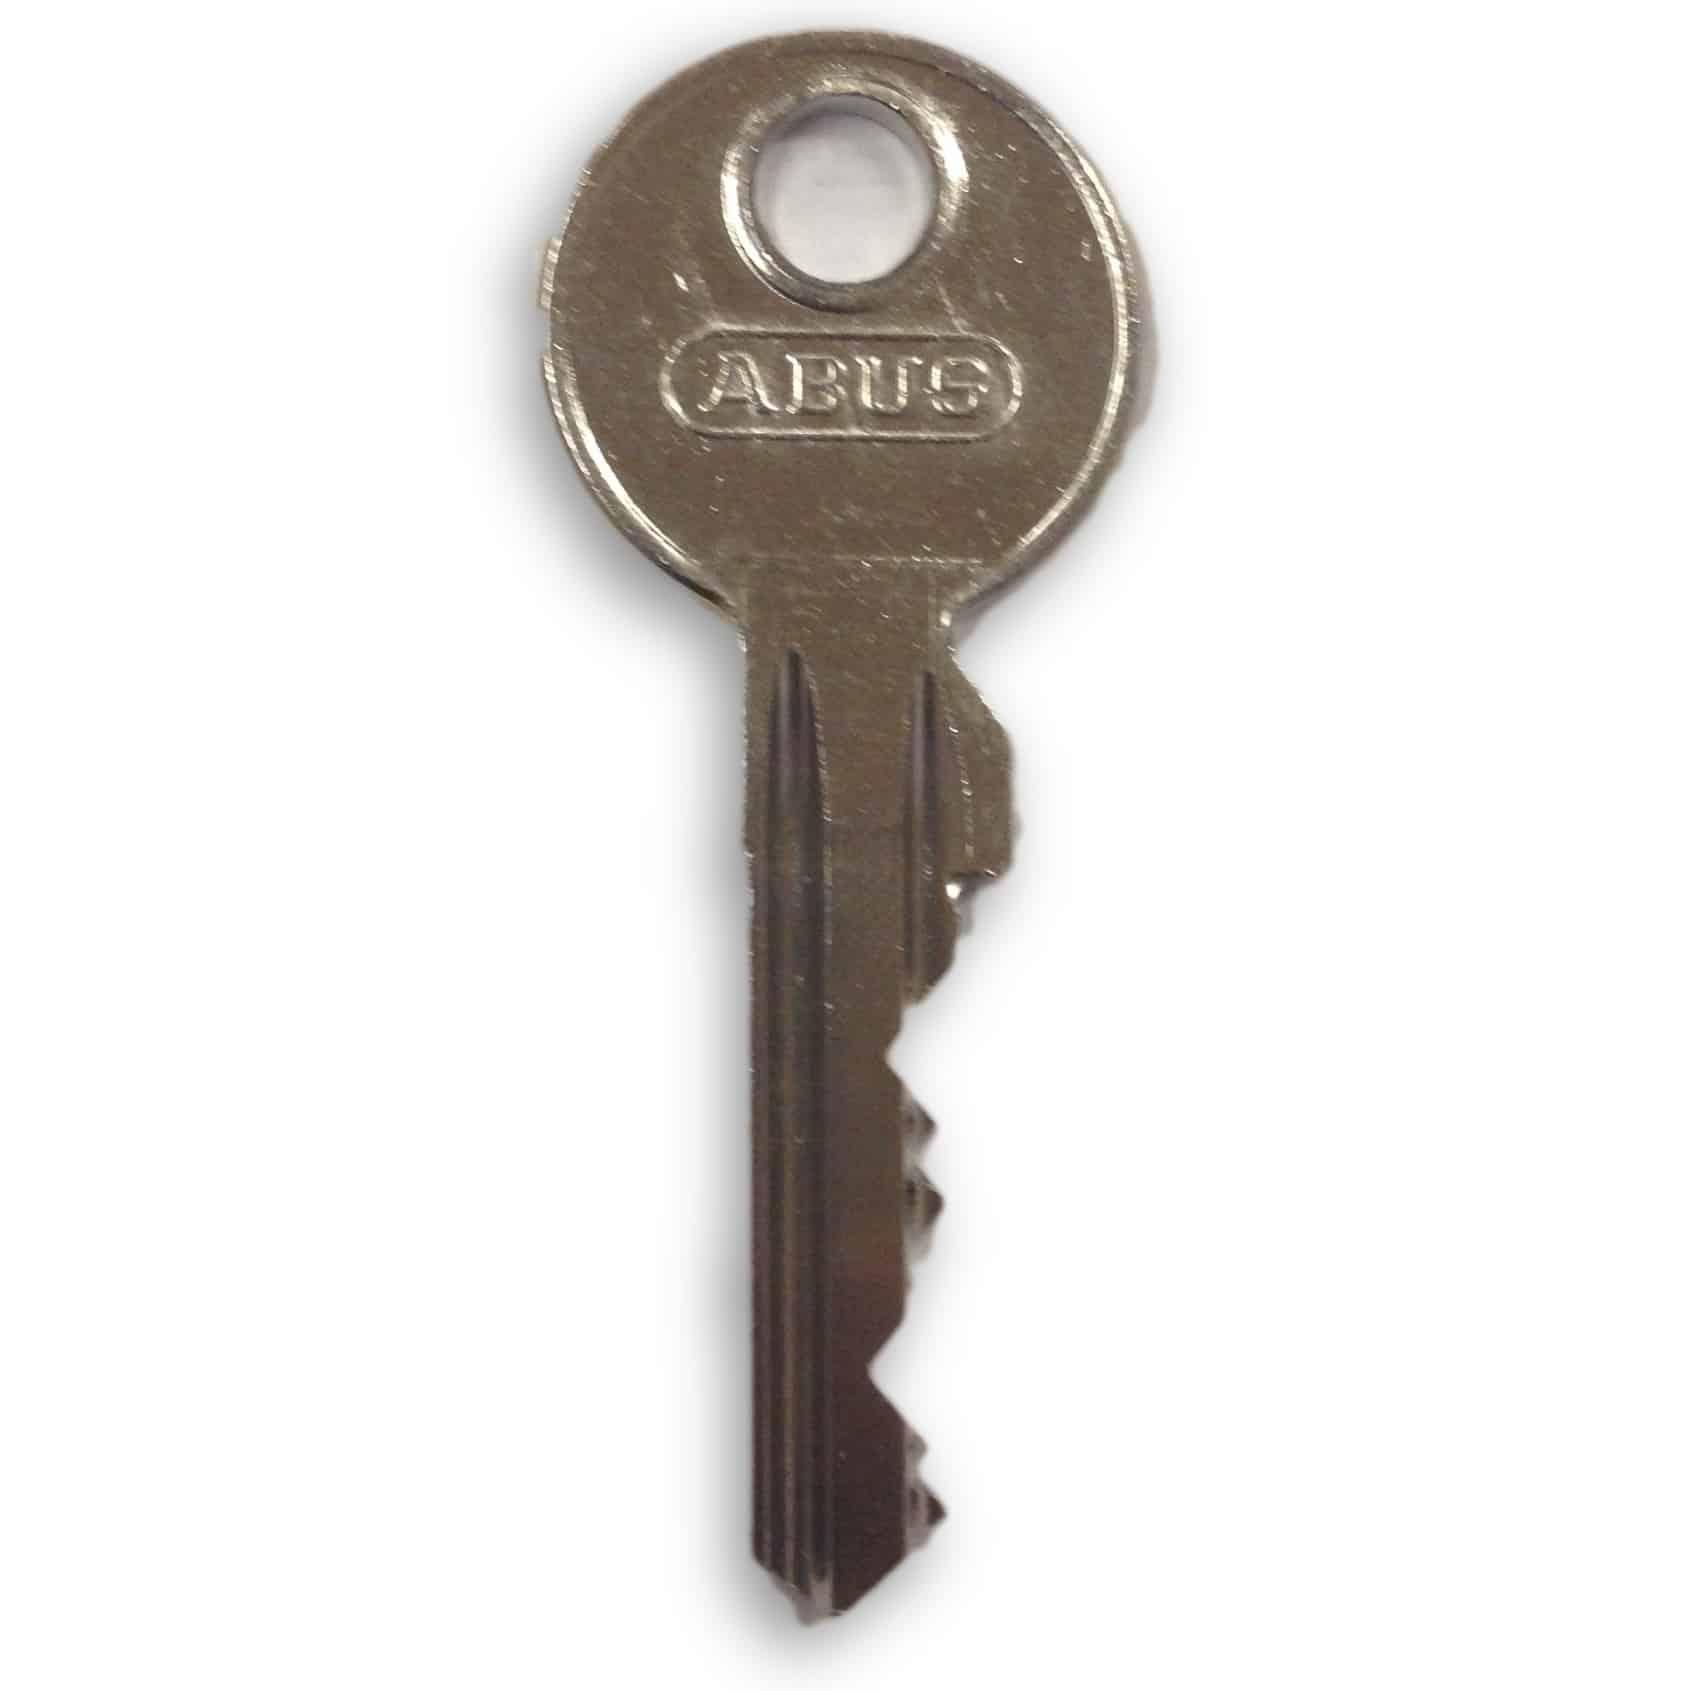 ABUS Geba 2A-series  sc 1 st  We Love Keys & Door Keys - We Love Keys online key-cutting service